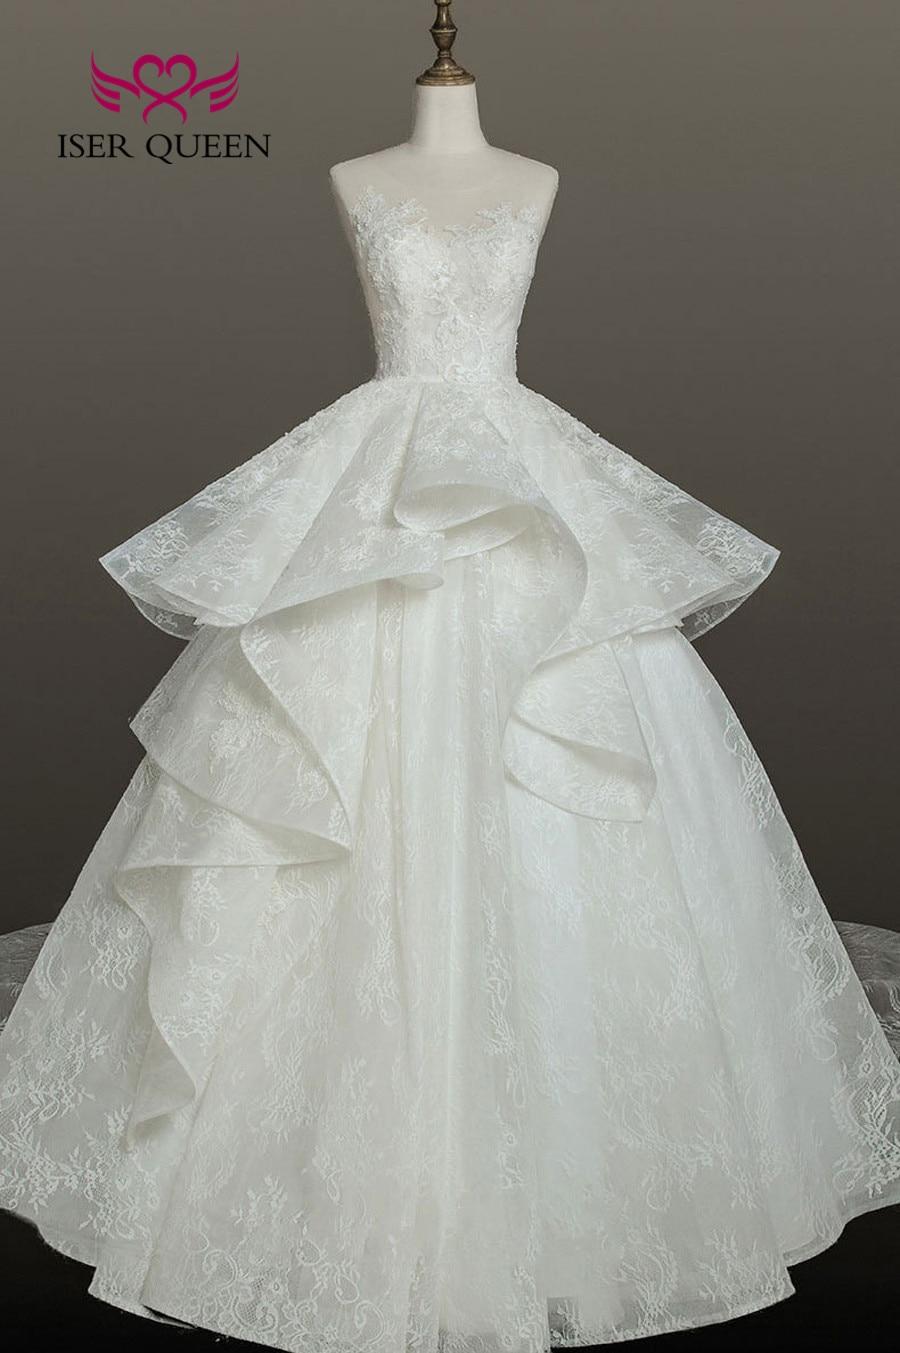 Weddings & Events Good 2019 New Arrival Beautiful Ball Gown Lace Wedding Dress Organza Dubai Wedding Gown Bride Dress Vestido De Noiva Wx0159 Attractive And Durable